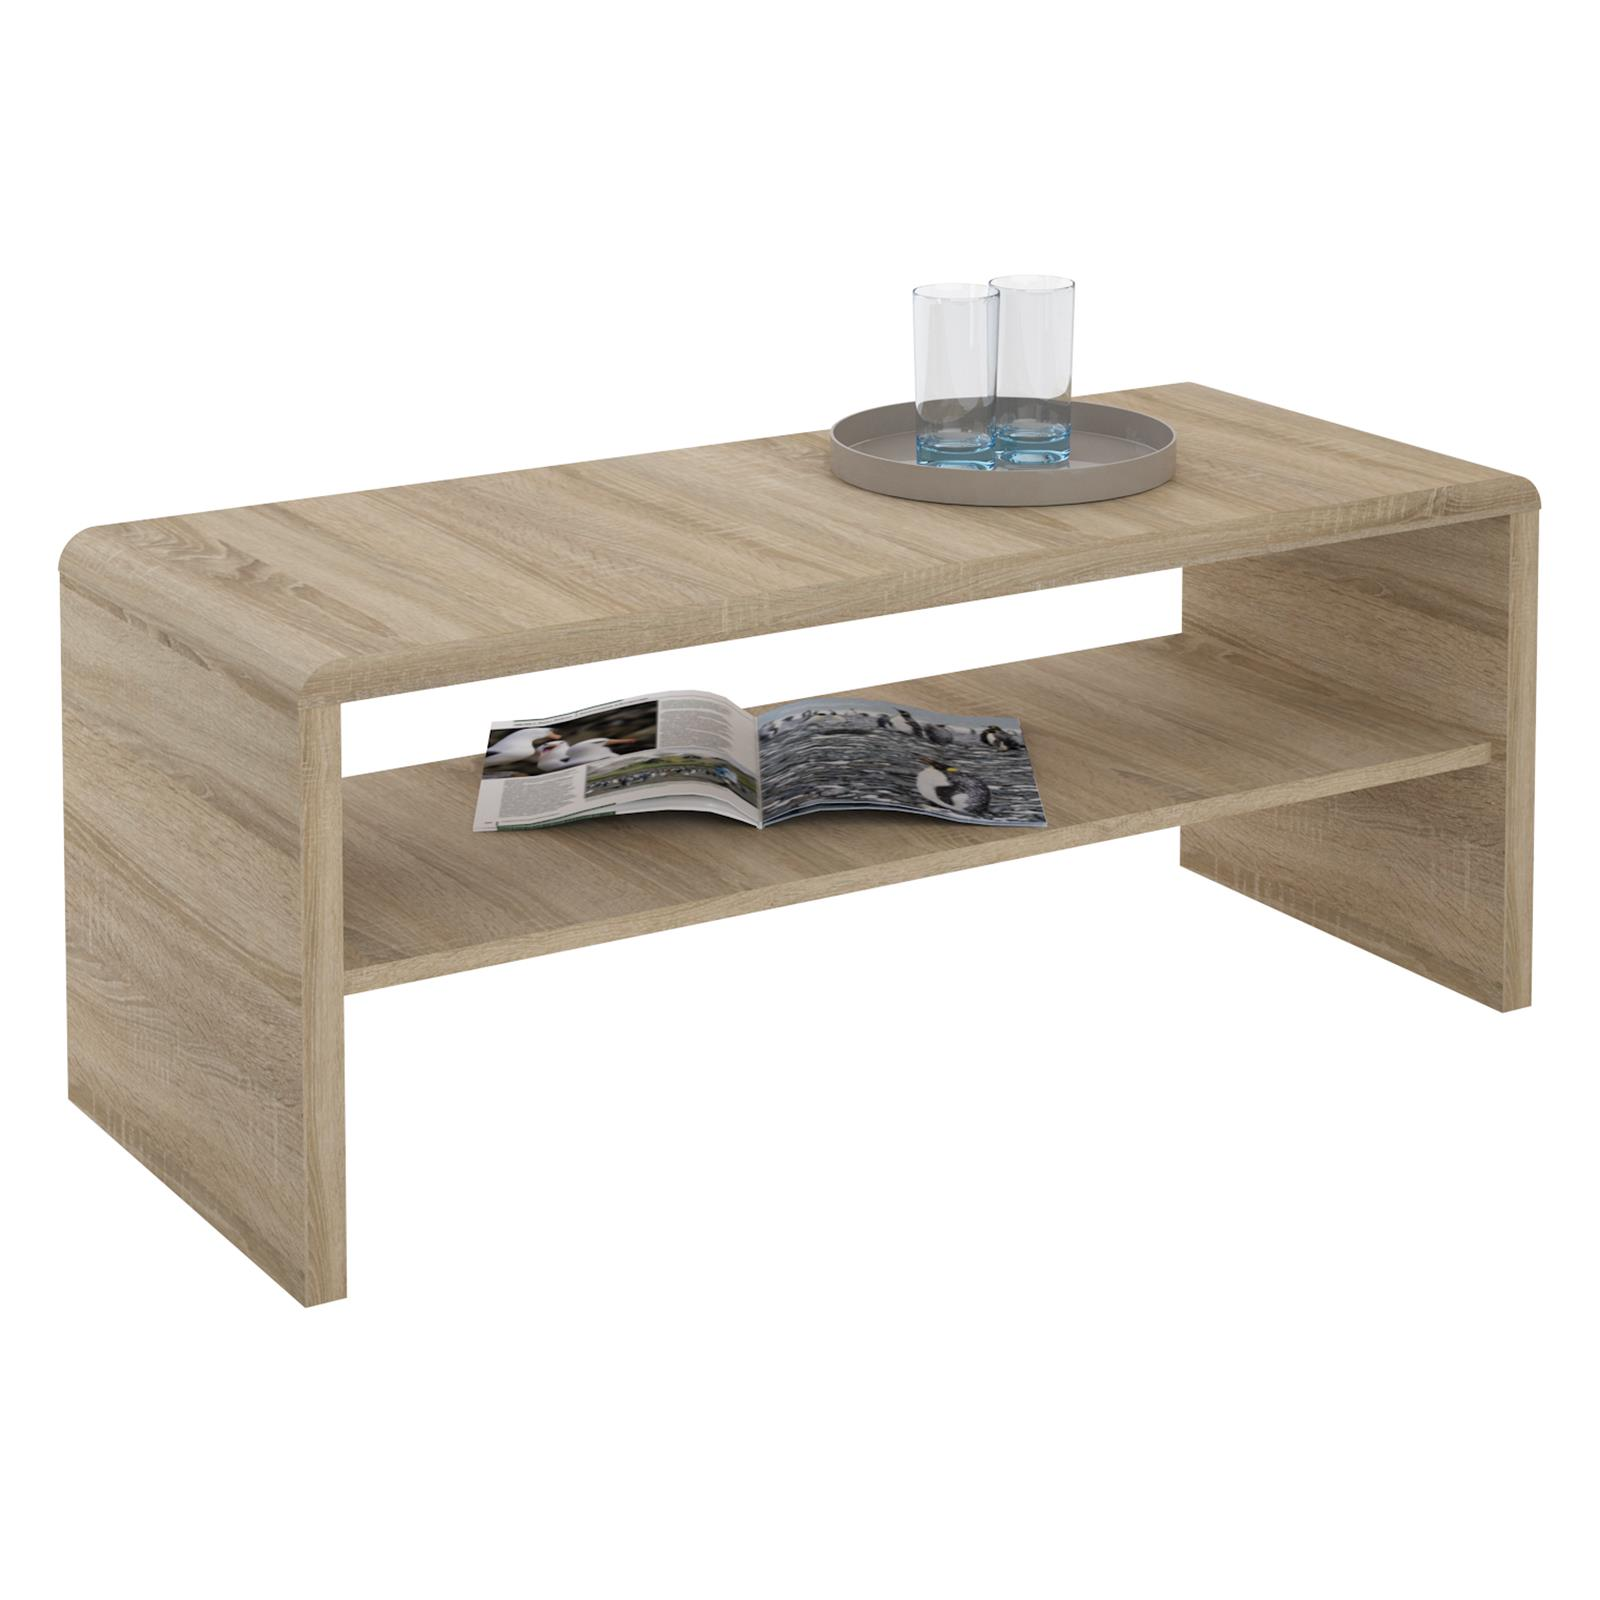 tv lowboard couchtisch lenni in sonoma eiche caro m bel. Black Bedroom Furniture Sets. Home Design Ideas